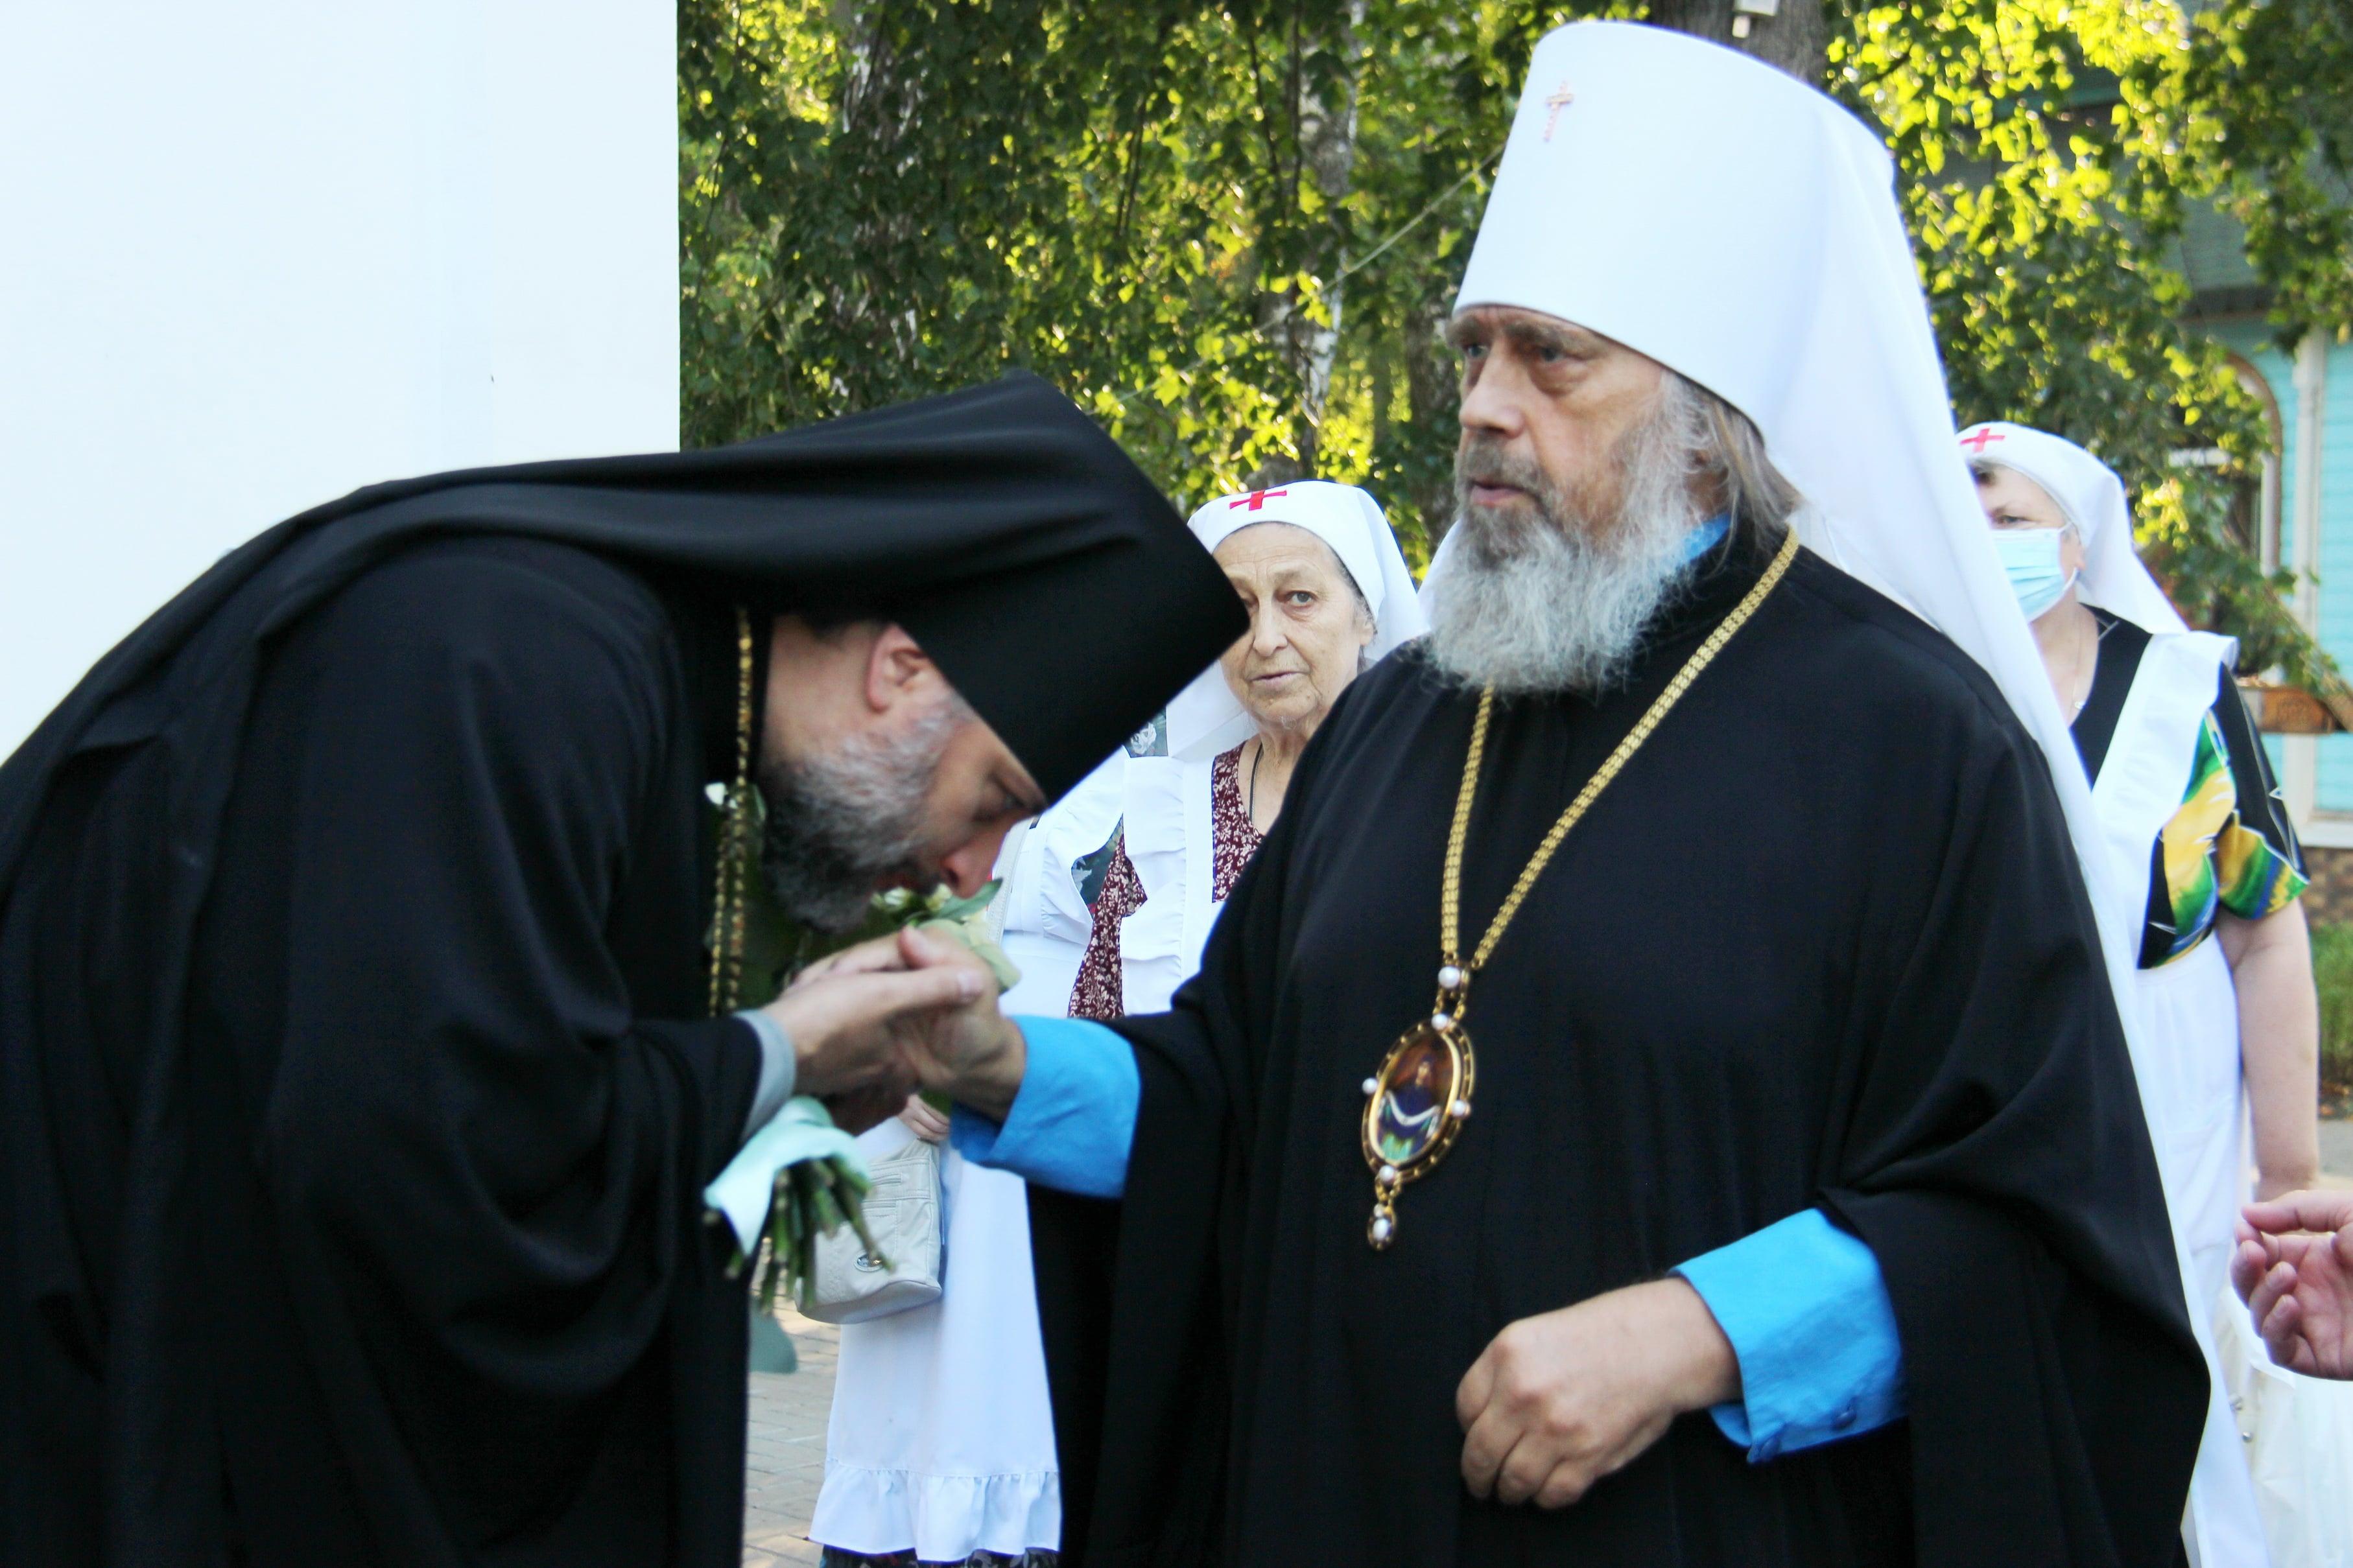 http://monuspen.ru/photoreports/4c37fc6d4cfa44c3ade52cad0af9c433.JPG